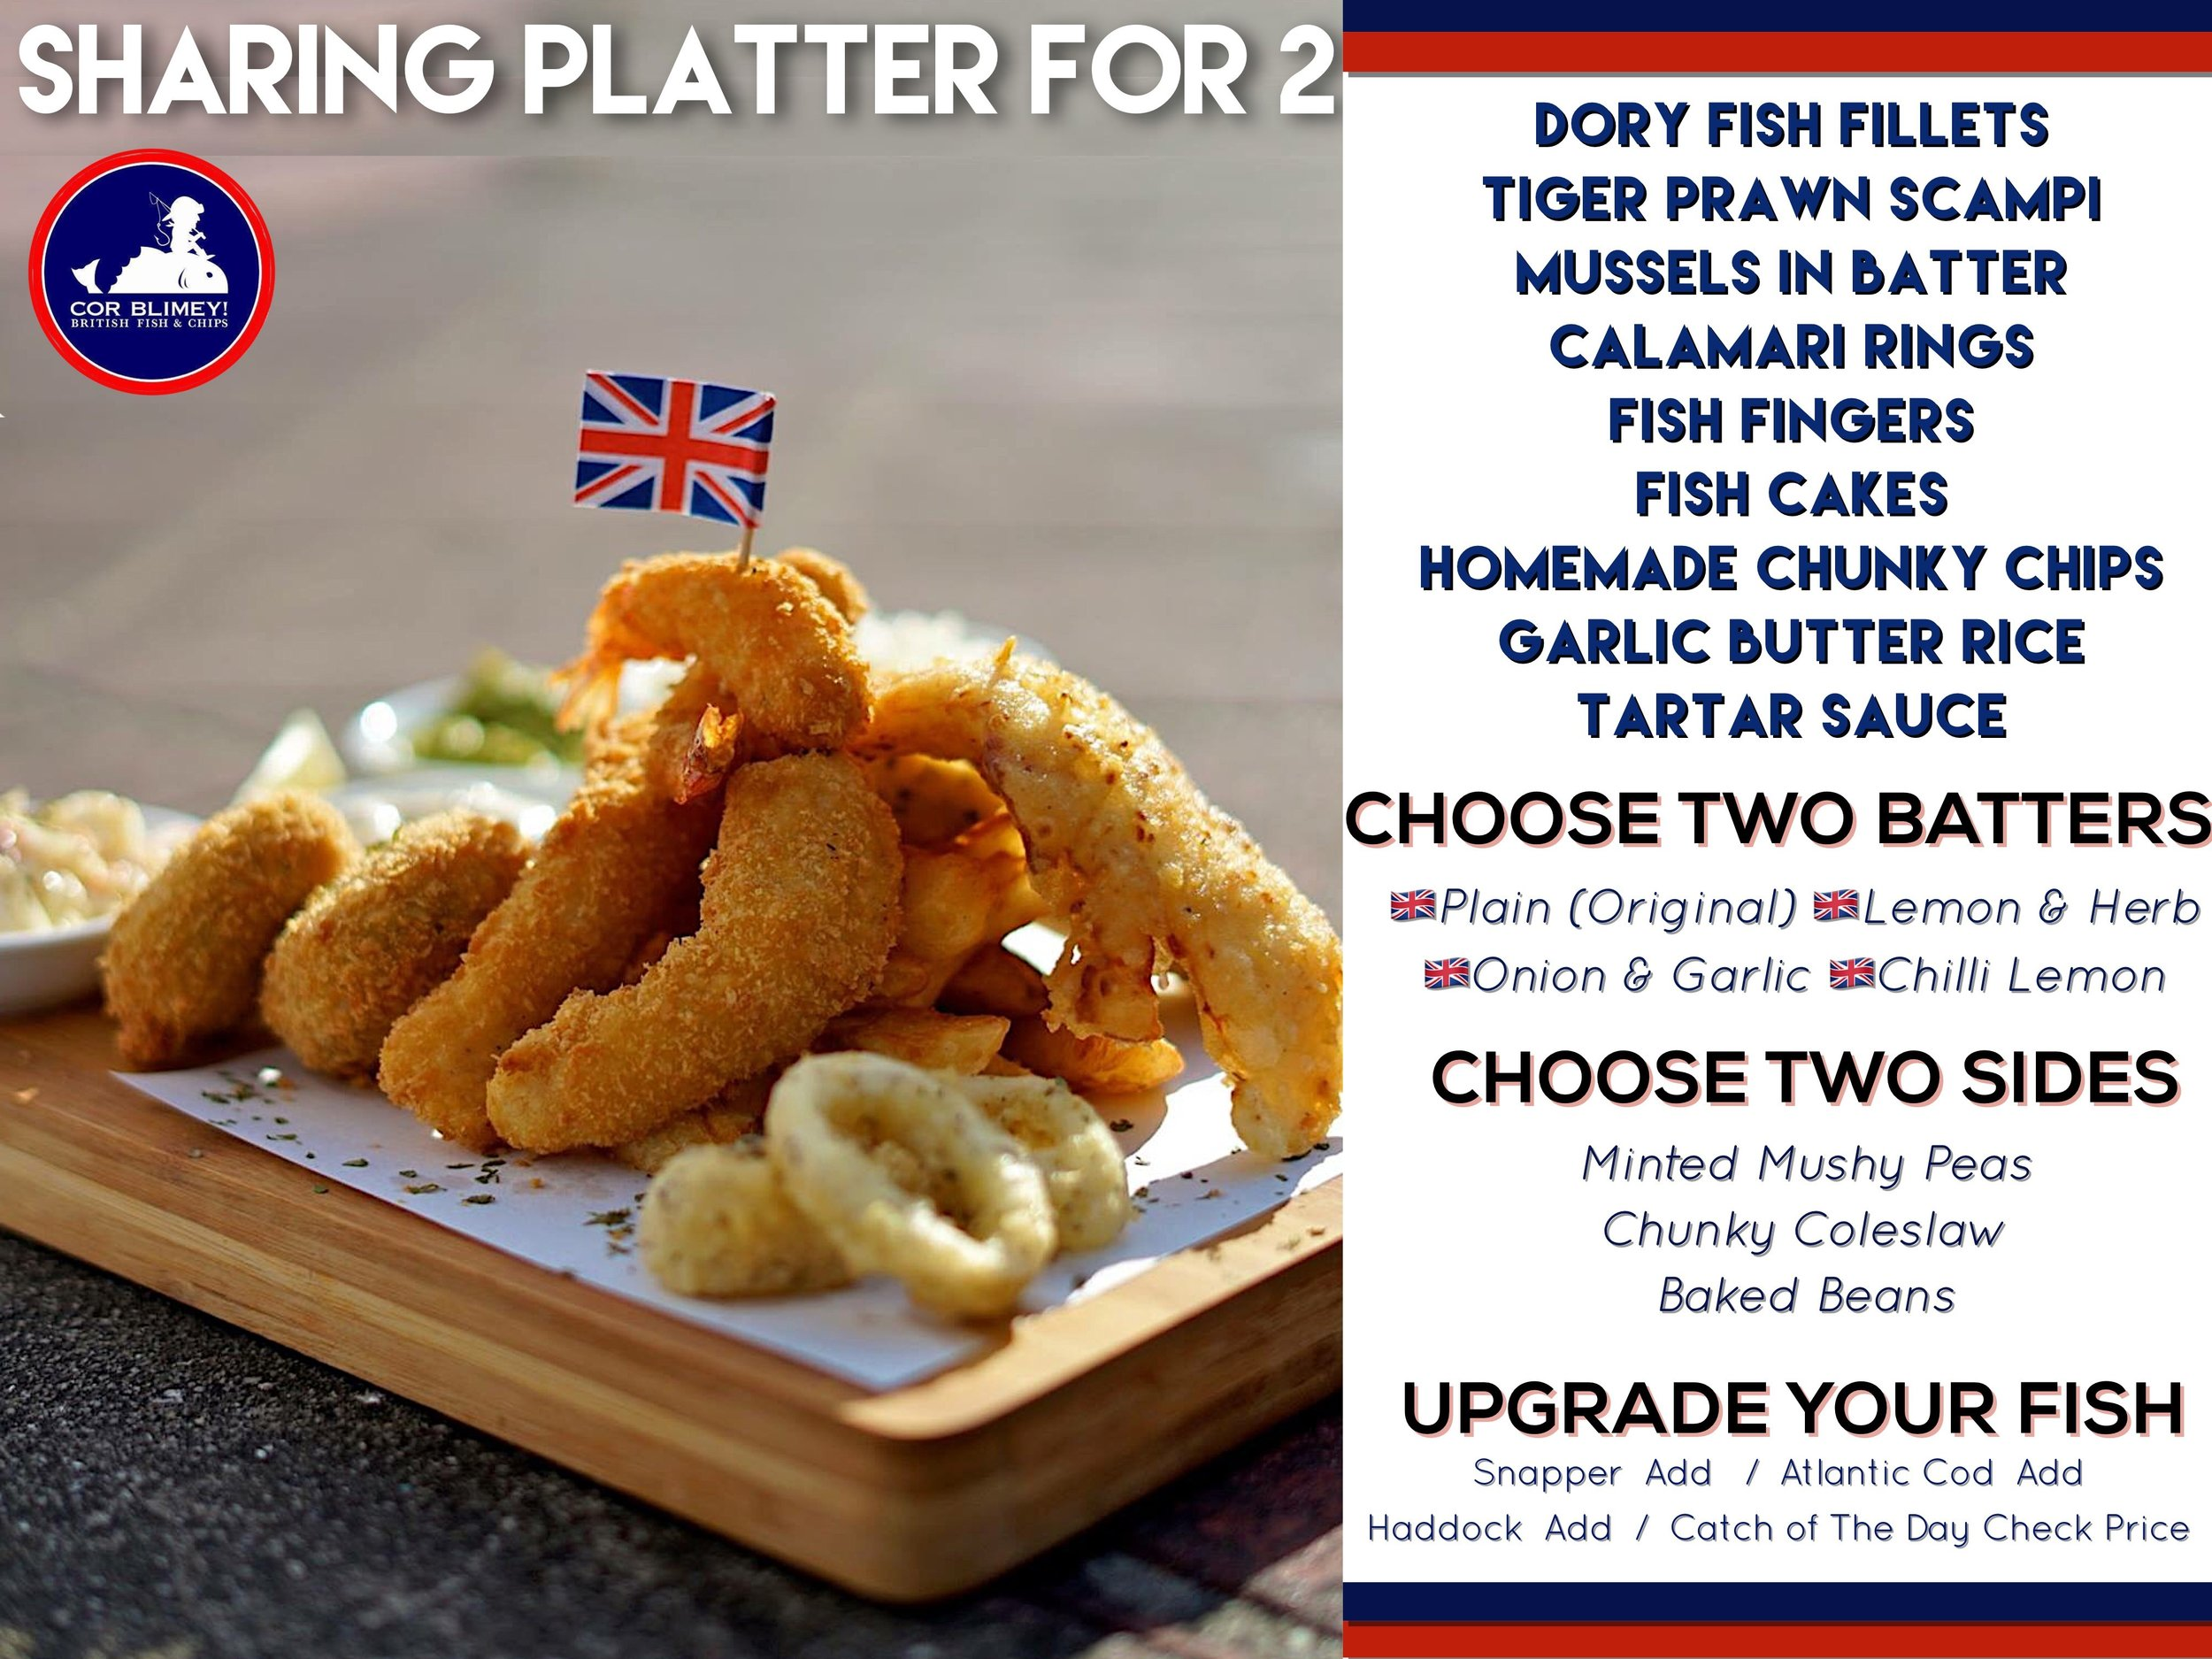 sharing platter for 2 no price.jpg